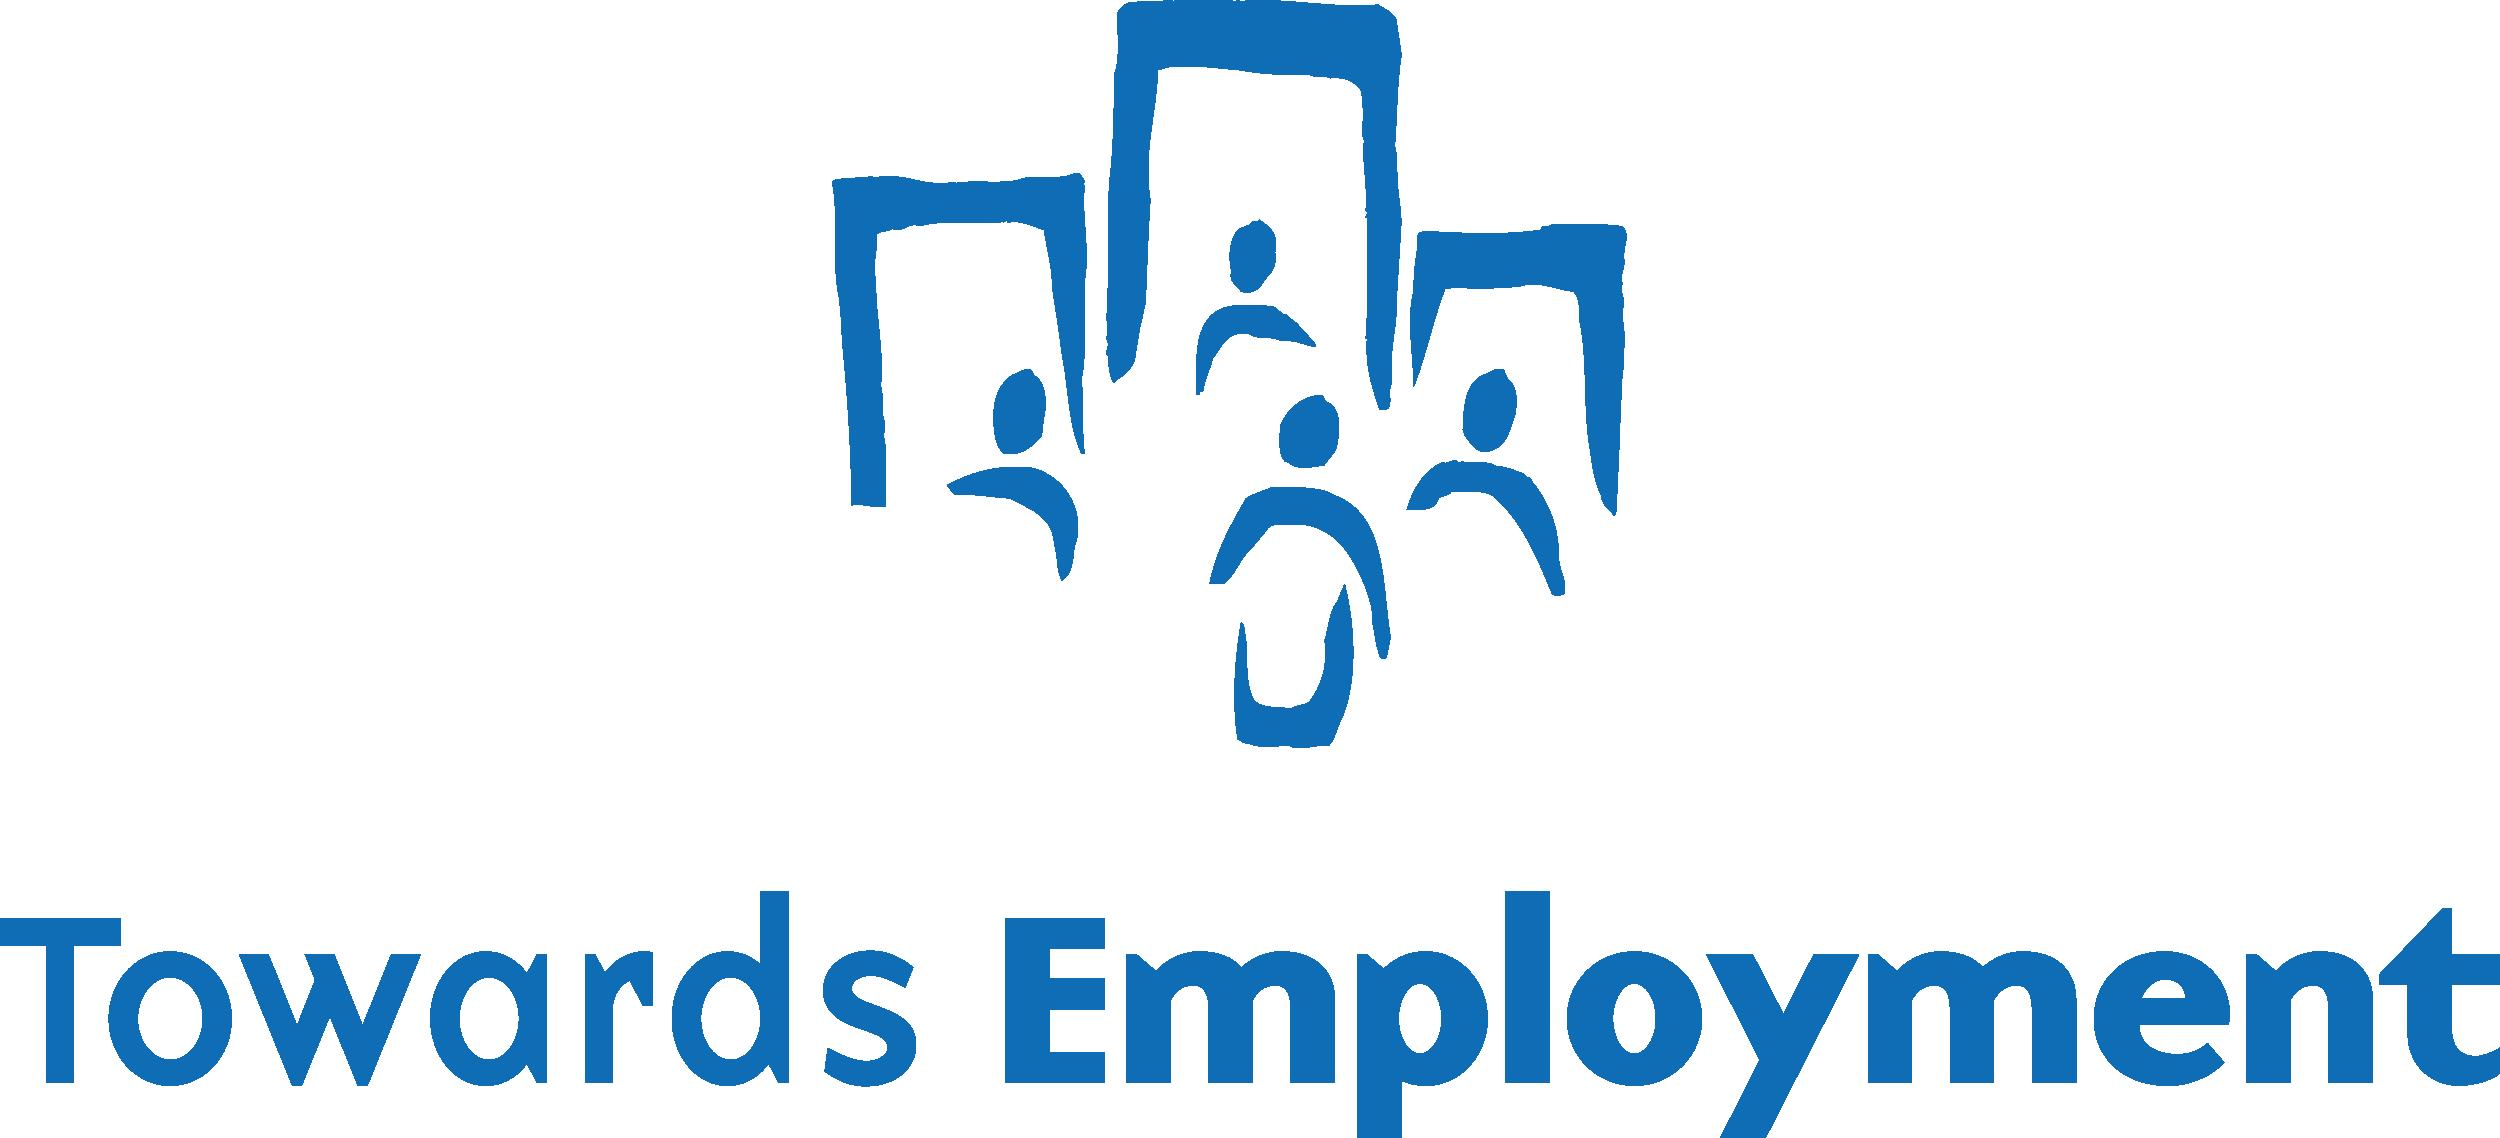 towards employment logo